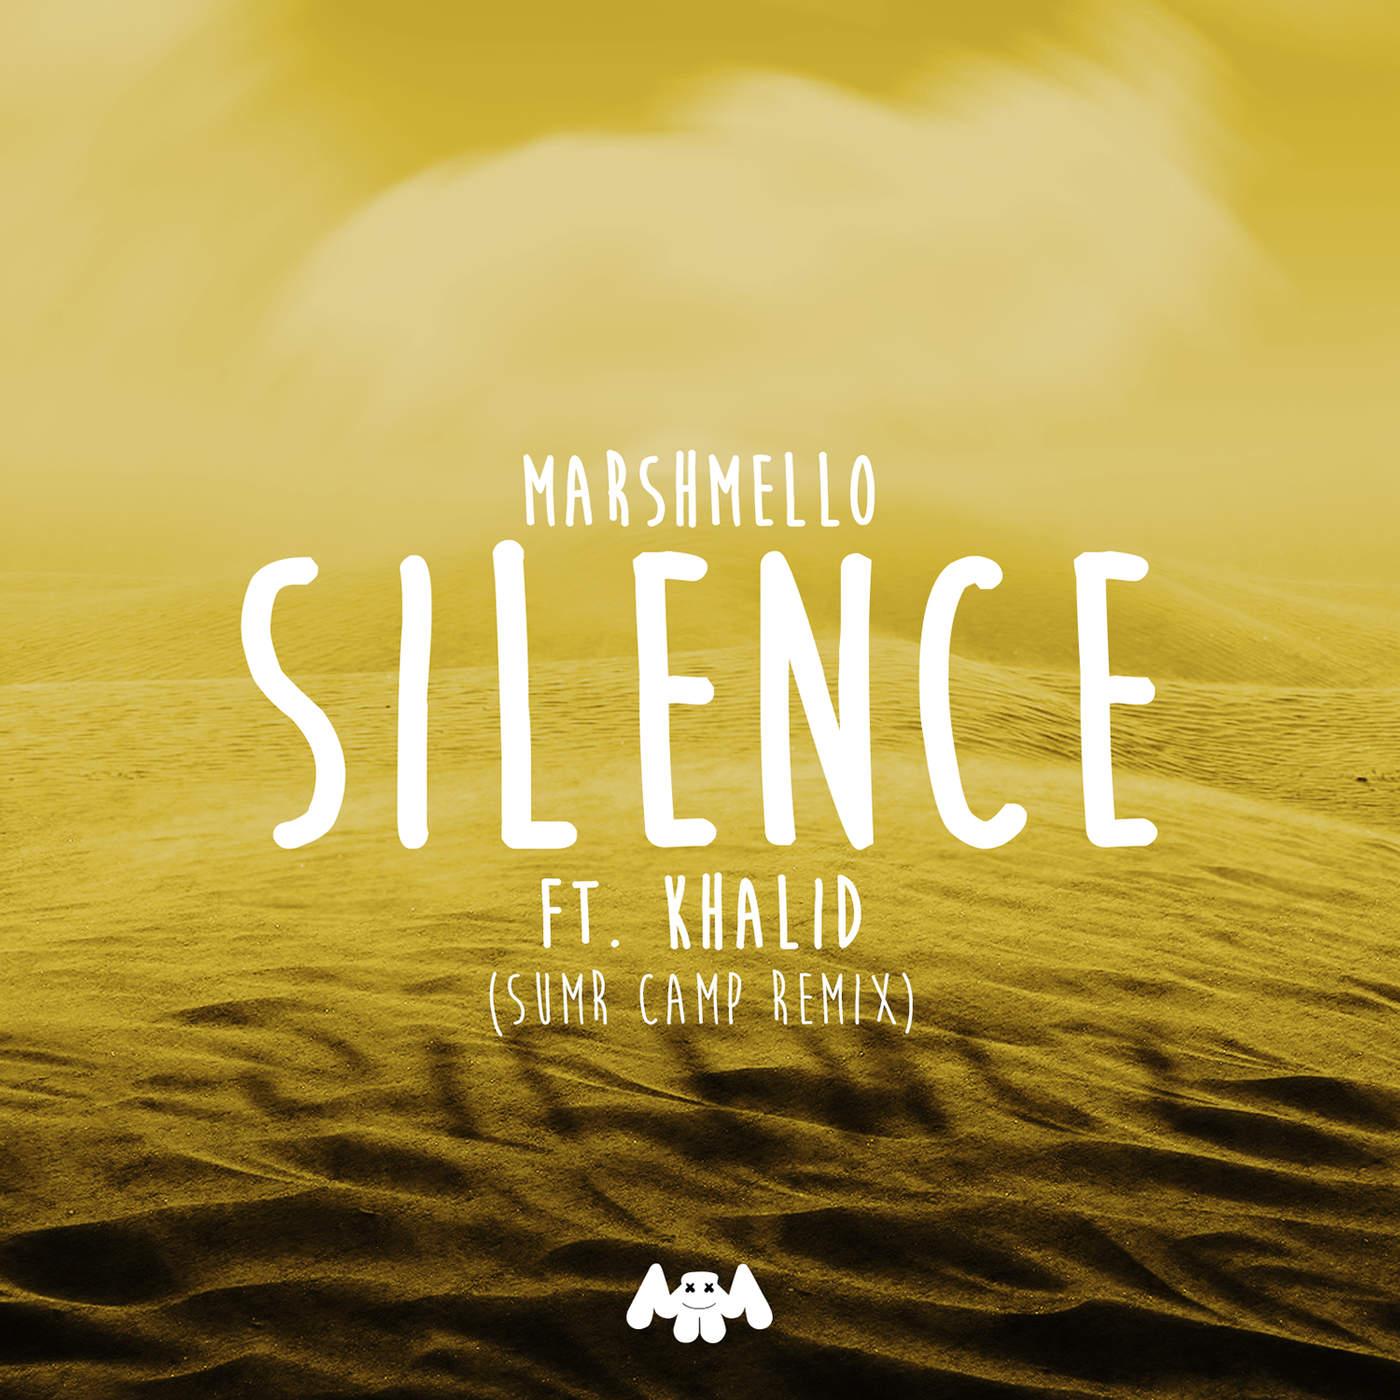 Marshmello, SUMR CAMP & Khalid - Silence (SUMR CAMP Remix) - Single